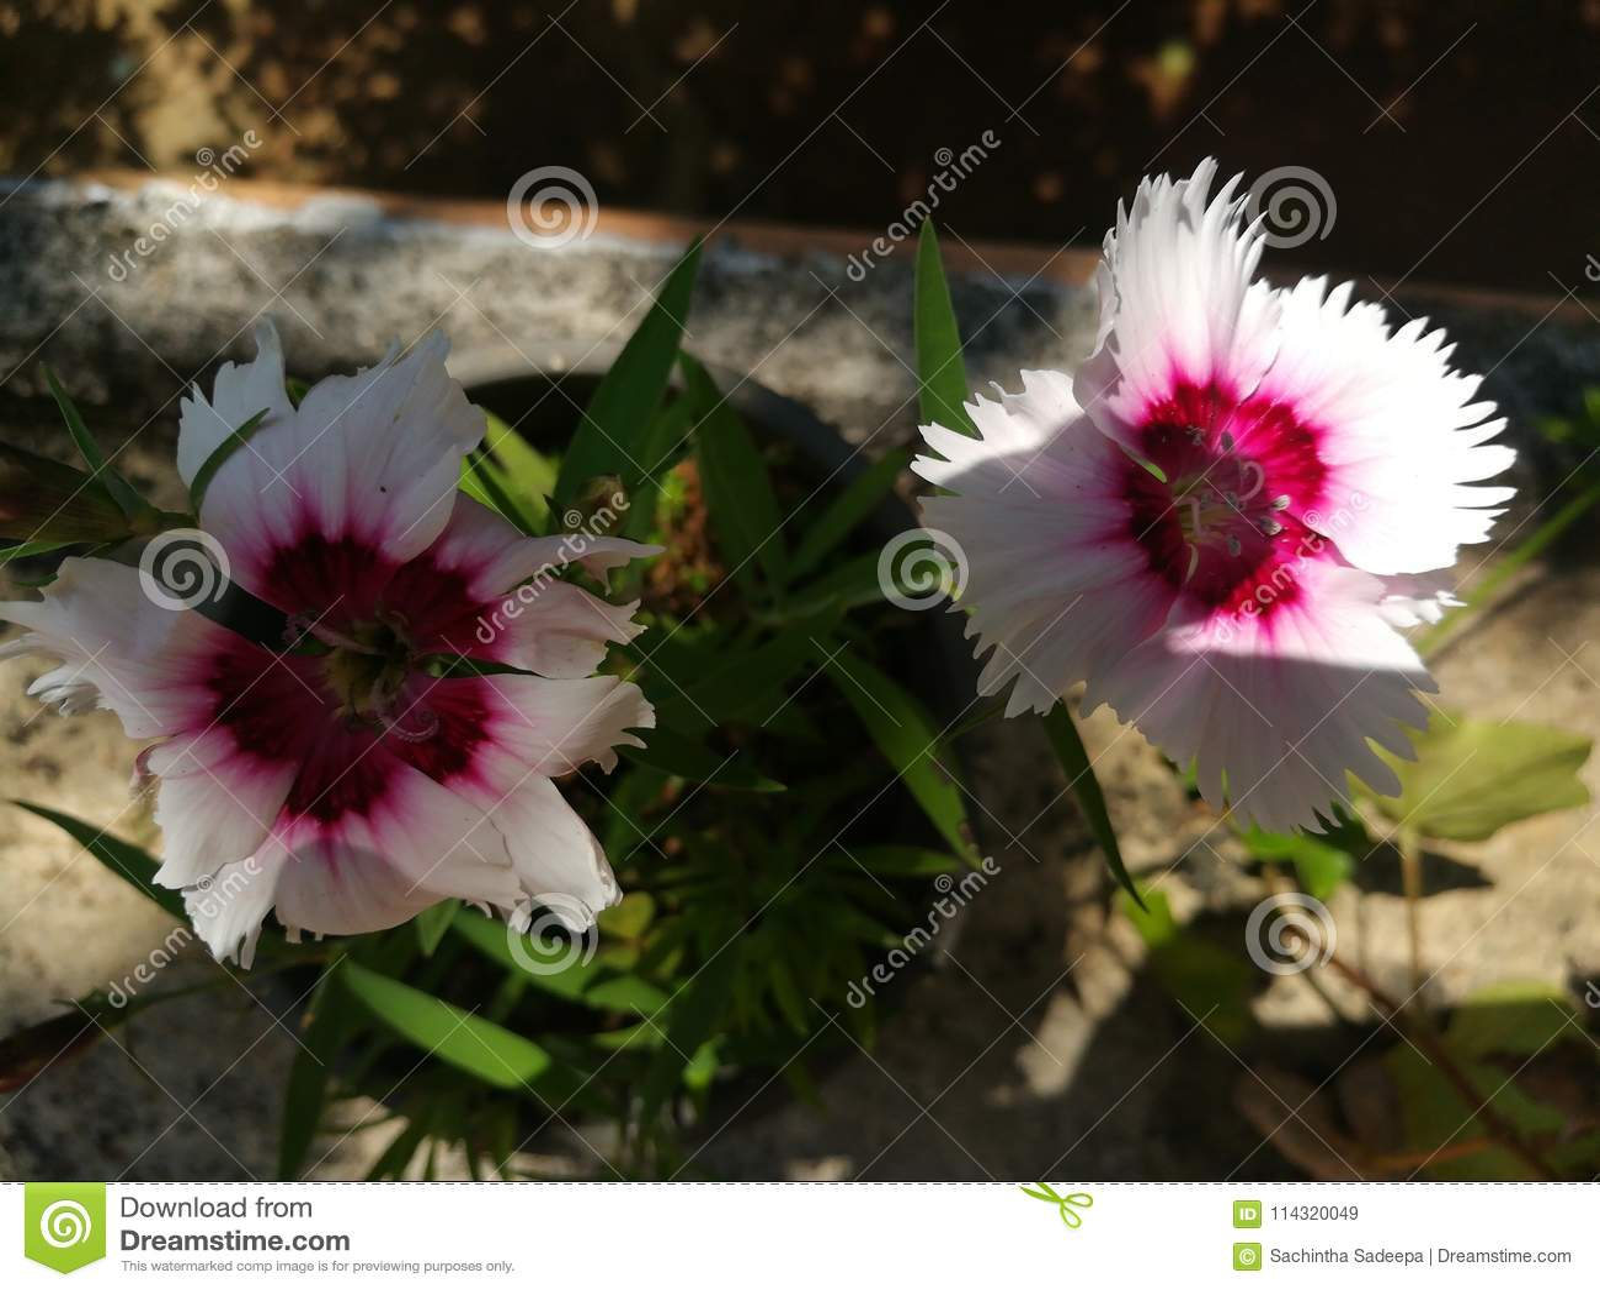 World most beautiful flowers stock image image of image rose download world most beautiful flowers stock image image of image rose 114320049 izmirmasajfo